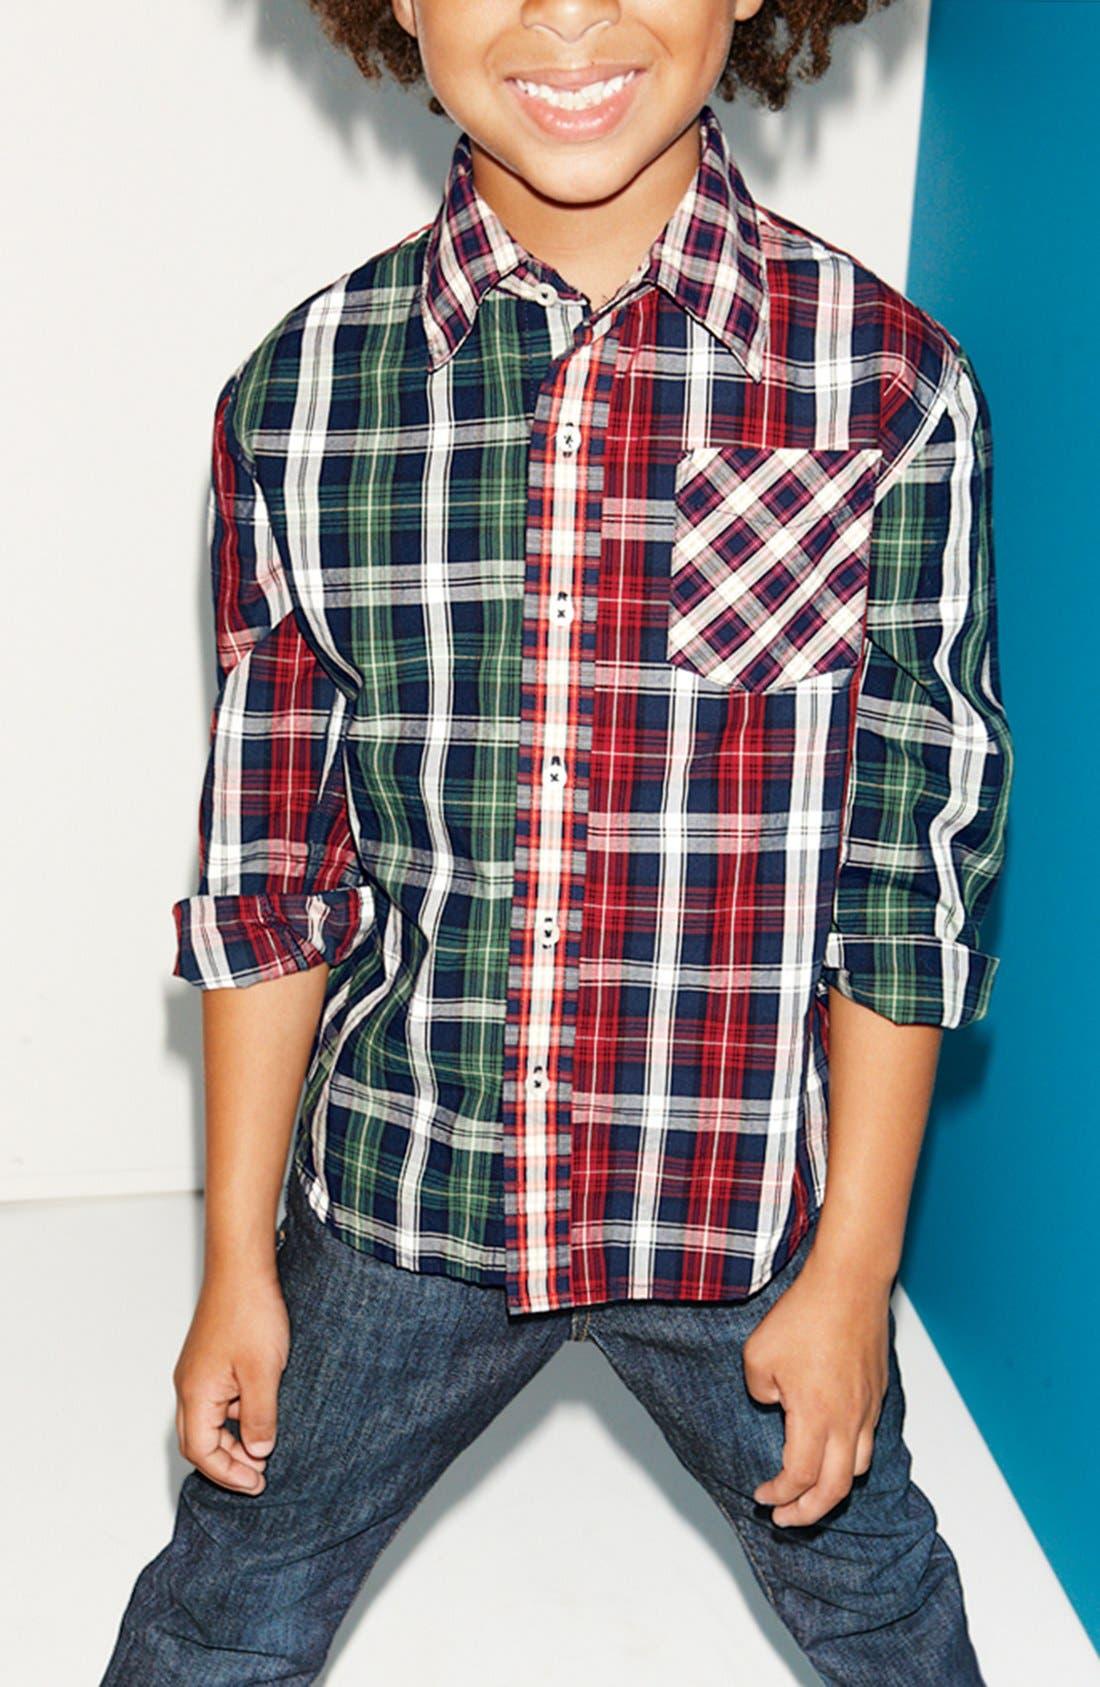 Main Image - Peek Woven Shirt & Jeans (Little Boys & Big Boys)